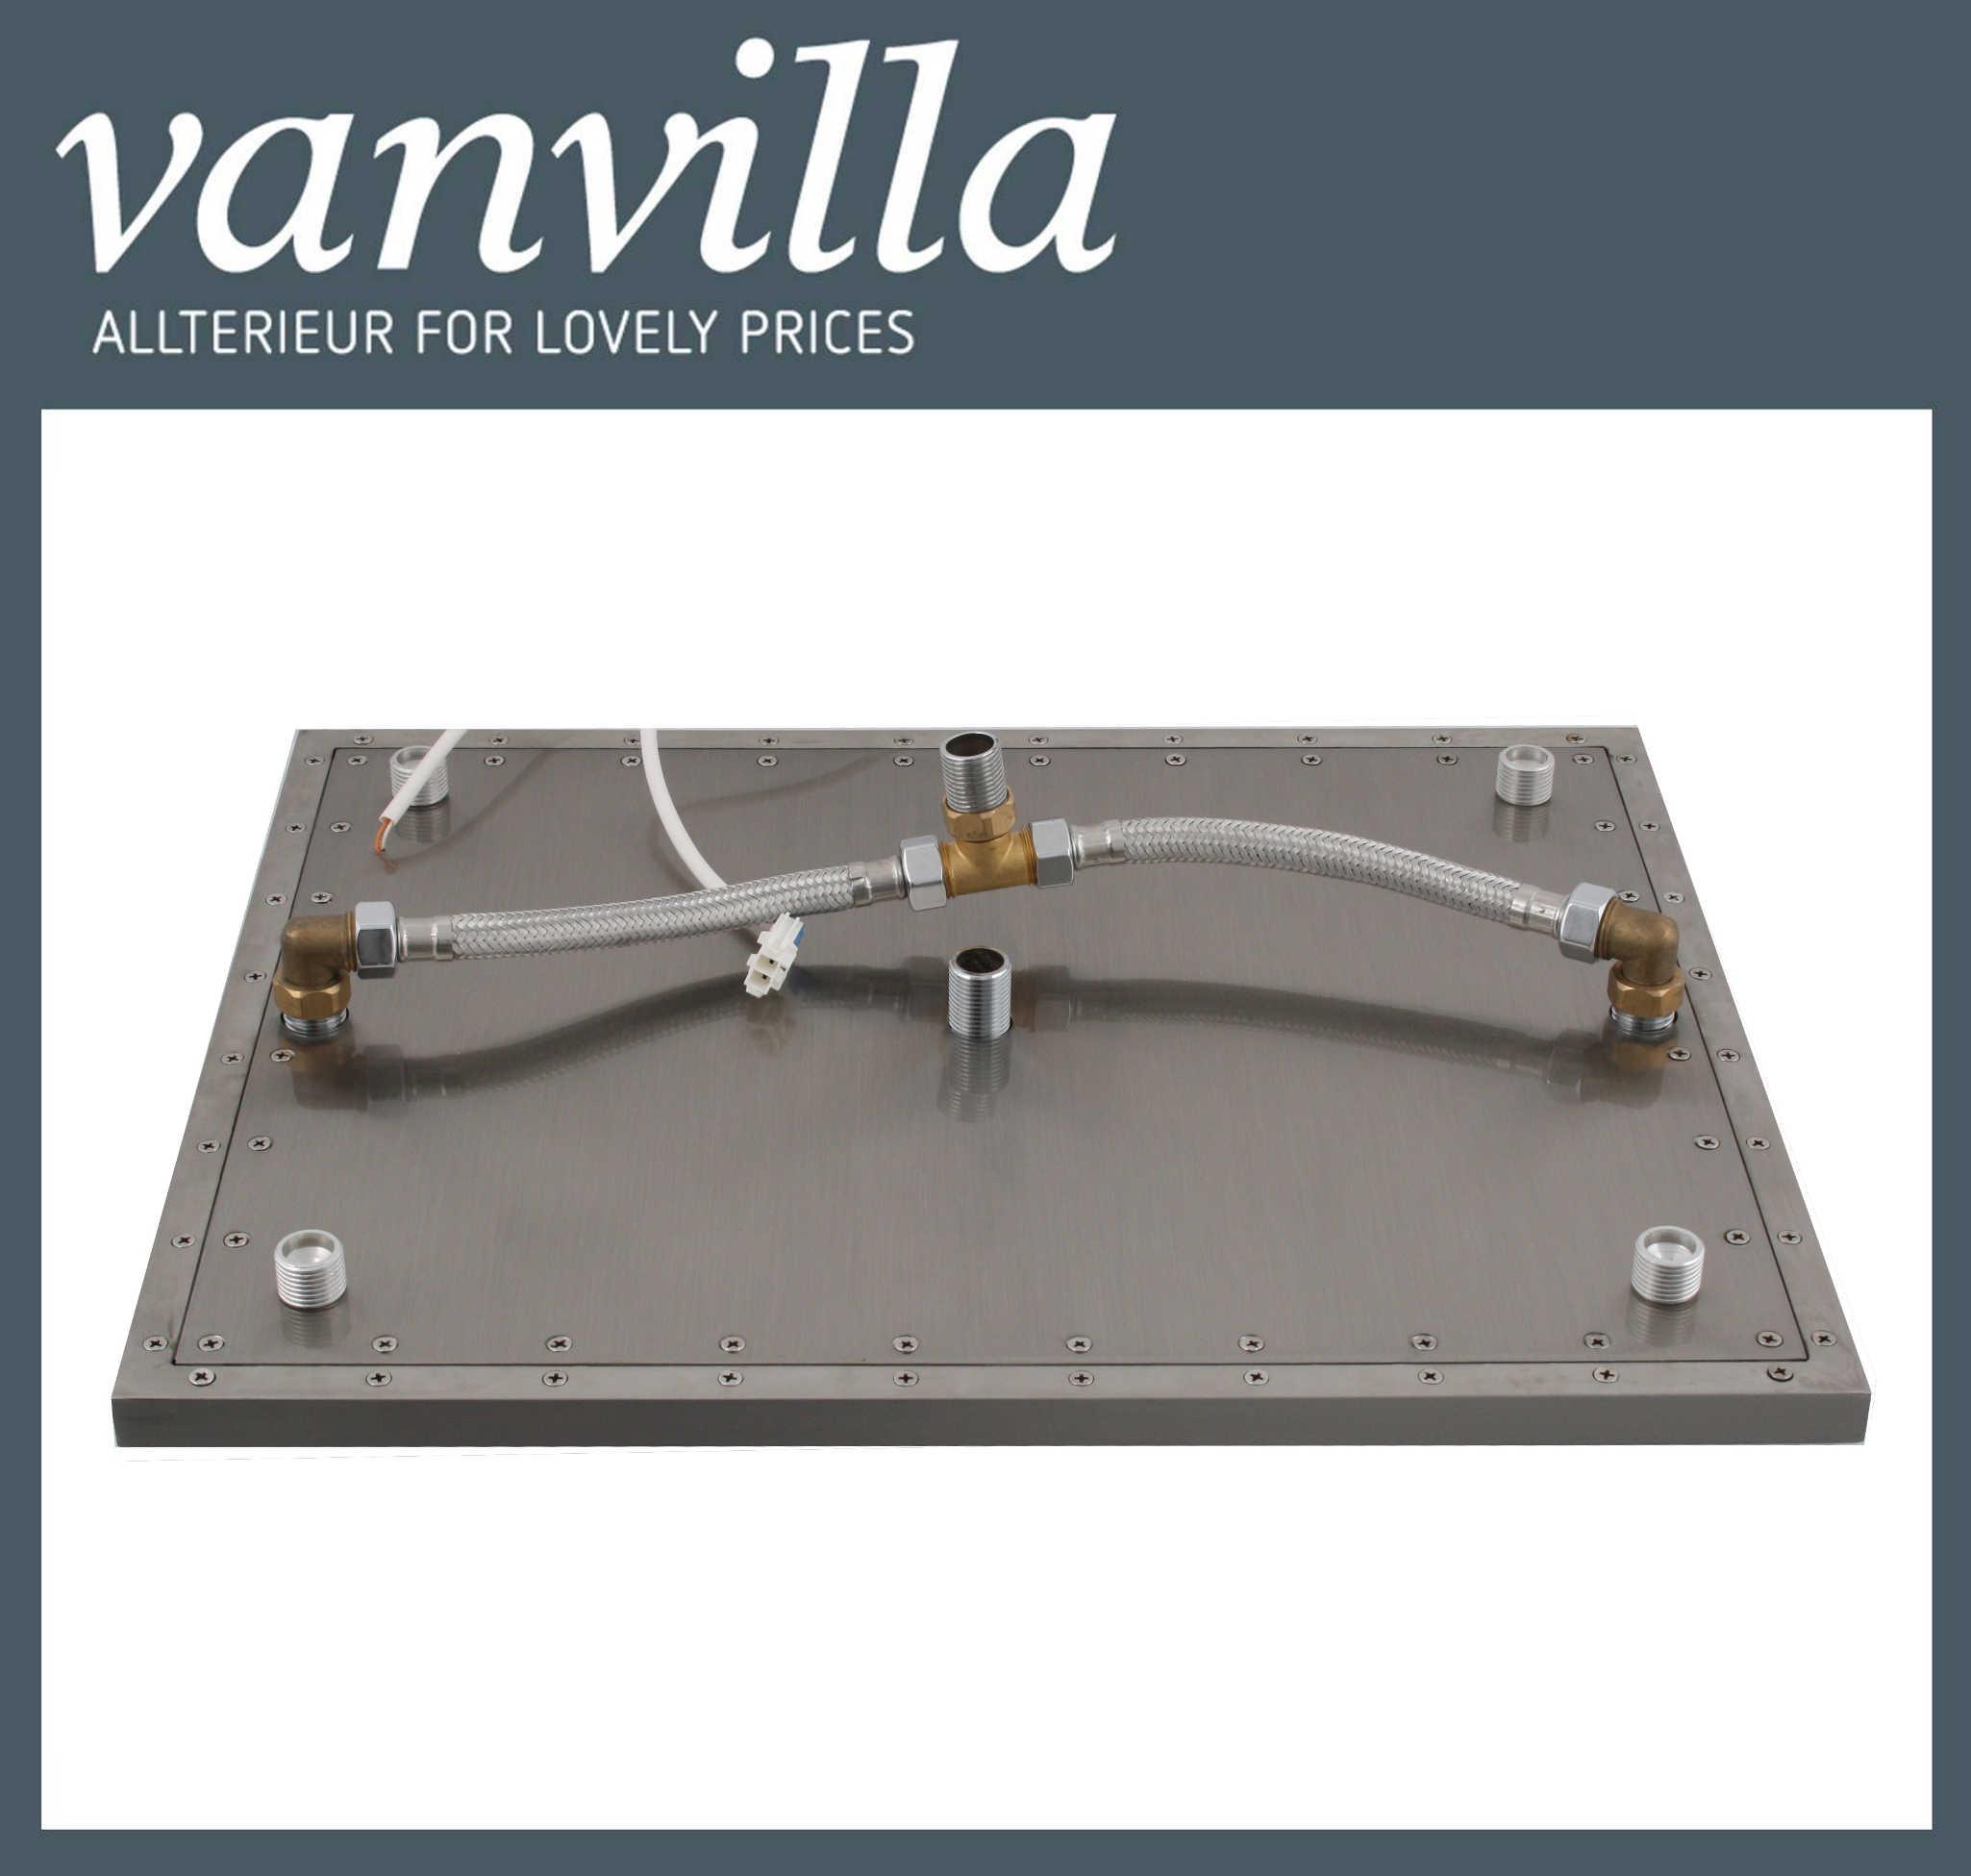 duschkopf vanvilla led 50cm x 40cm, edelstahl gebürstet, 8081-s/8134 - Regendusche Led